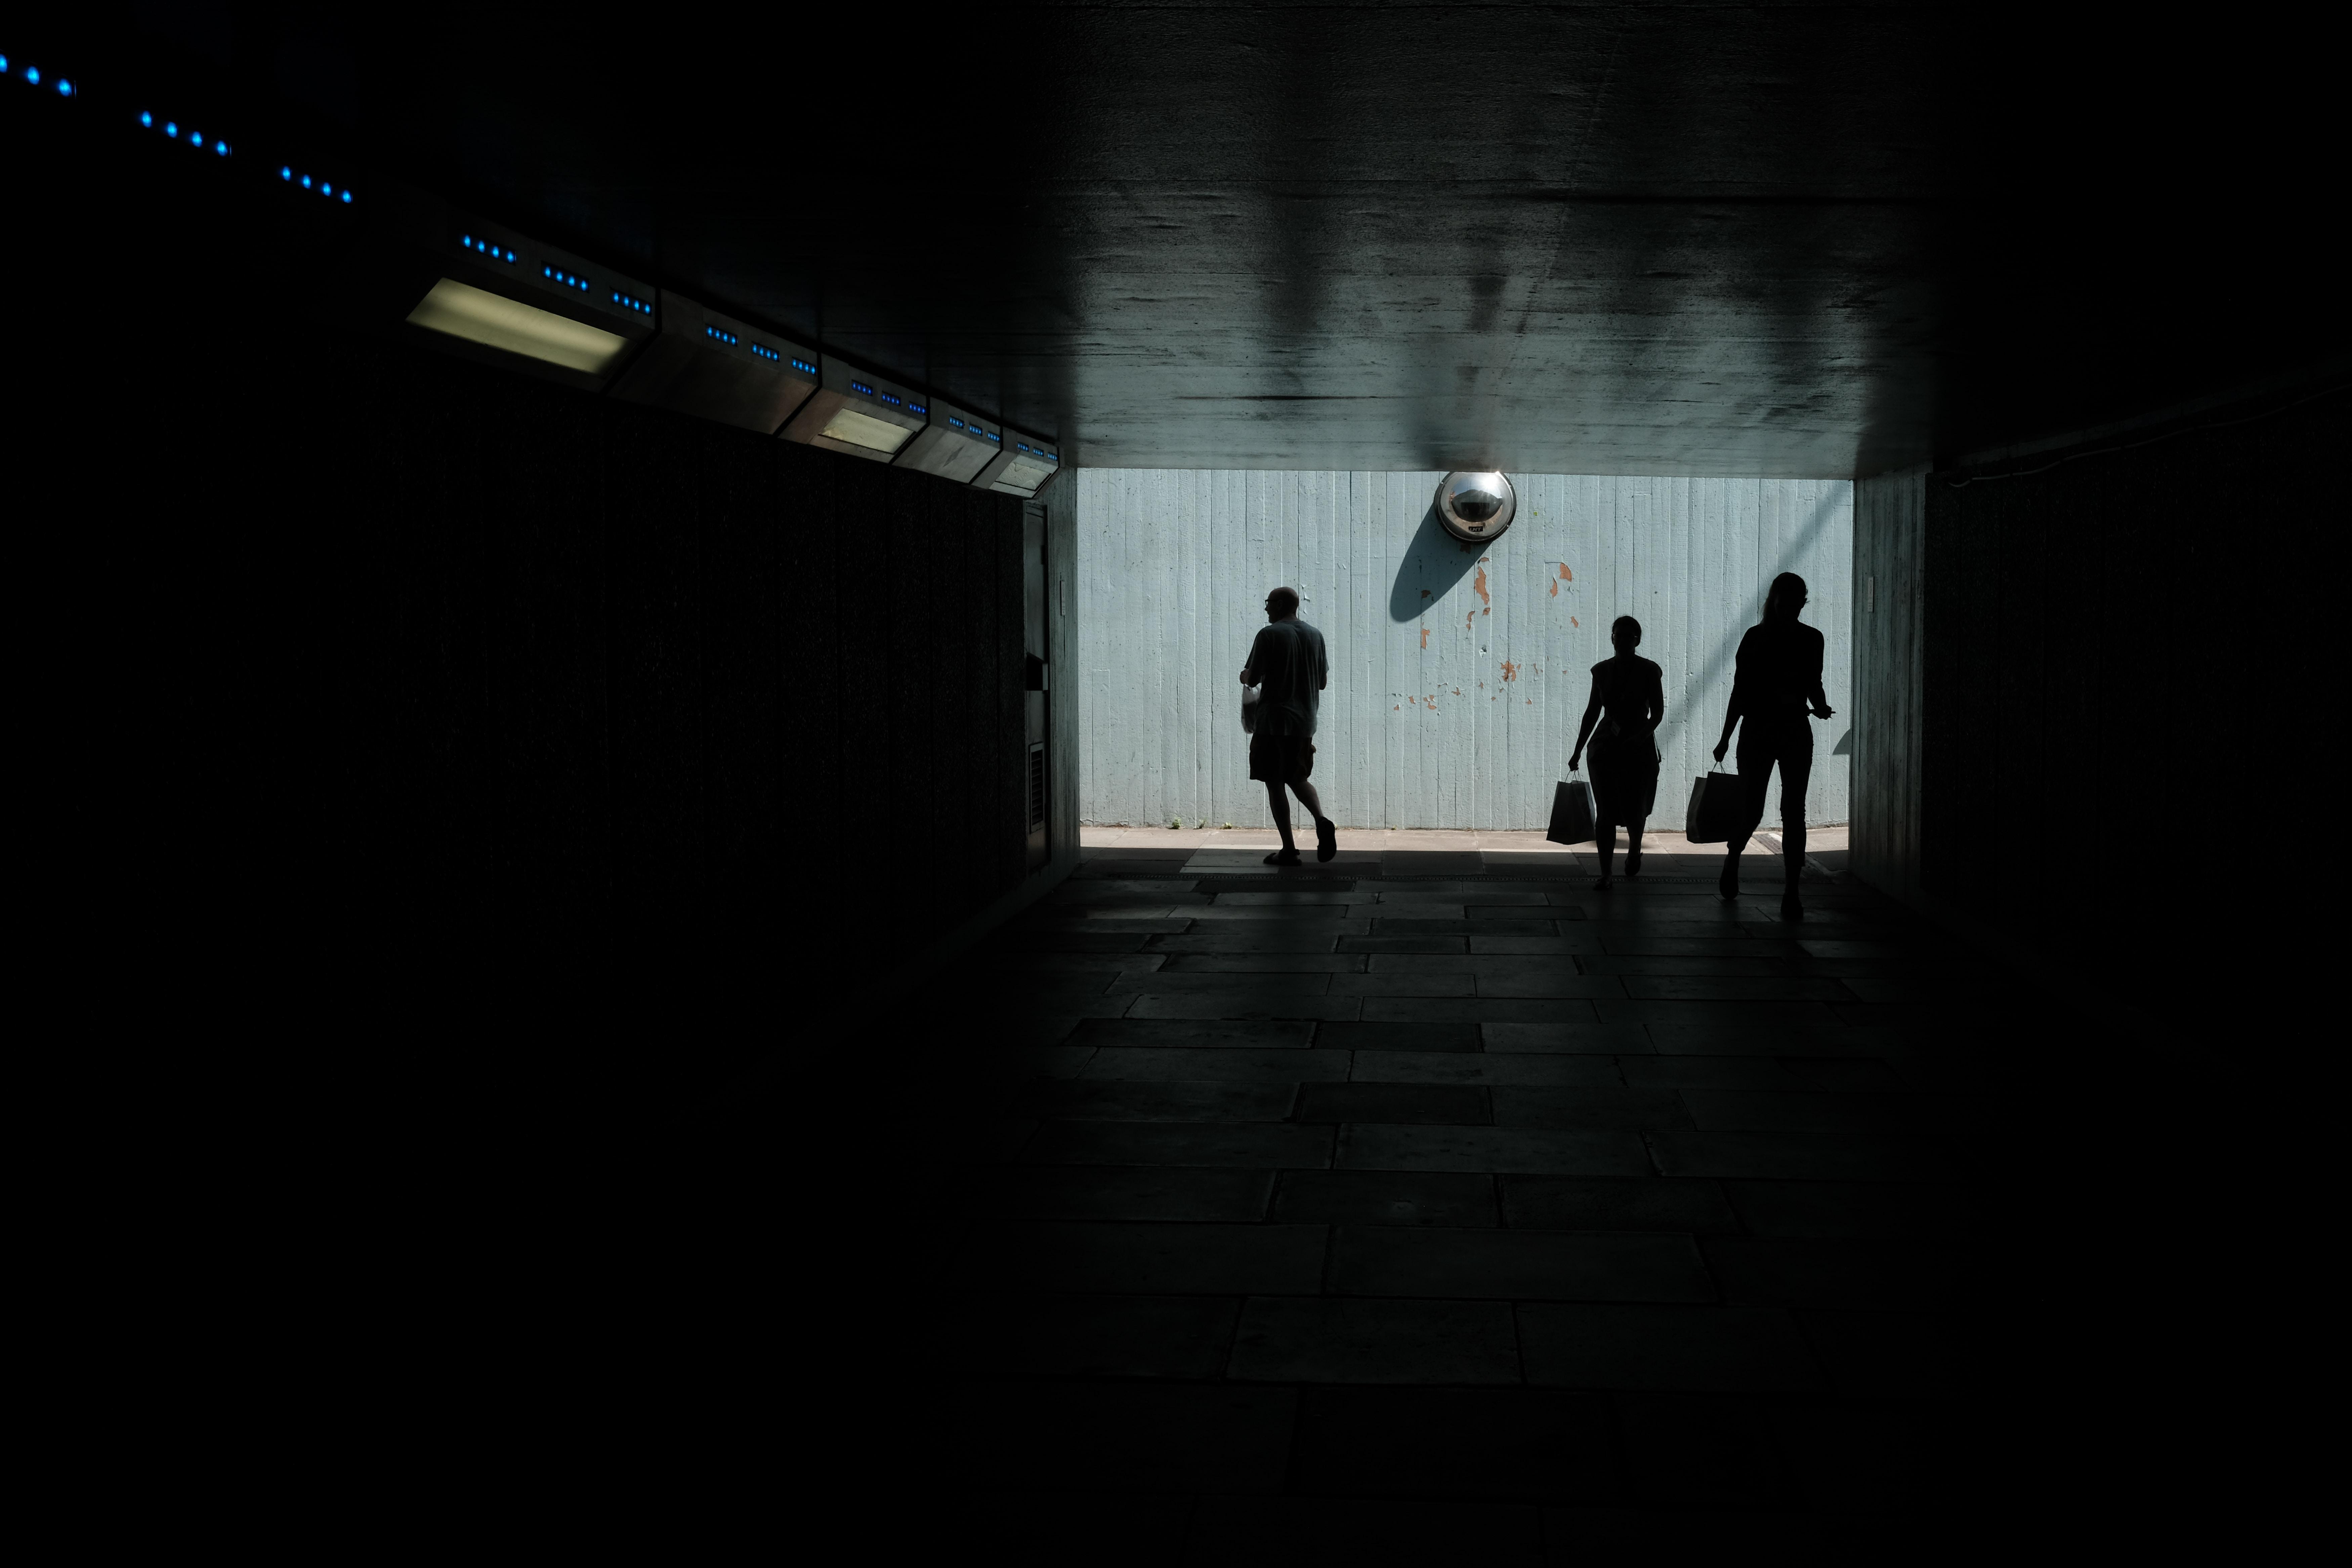 three persons walking through dark pathway